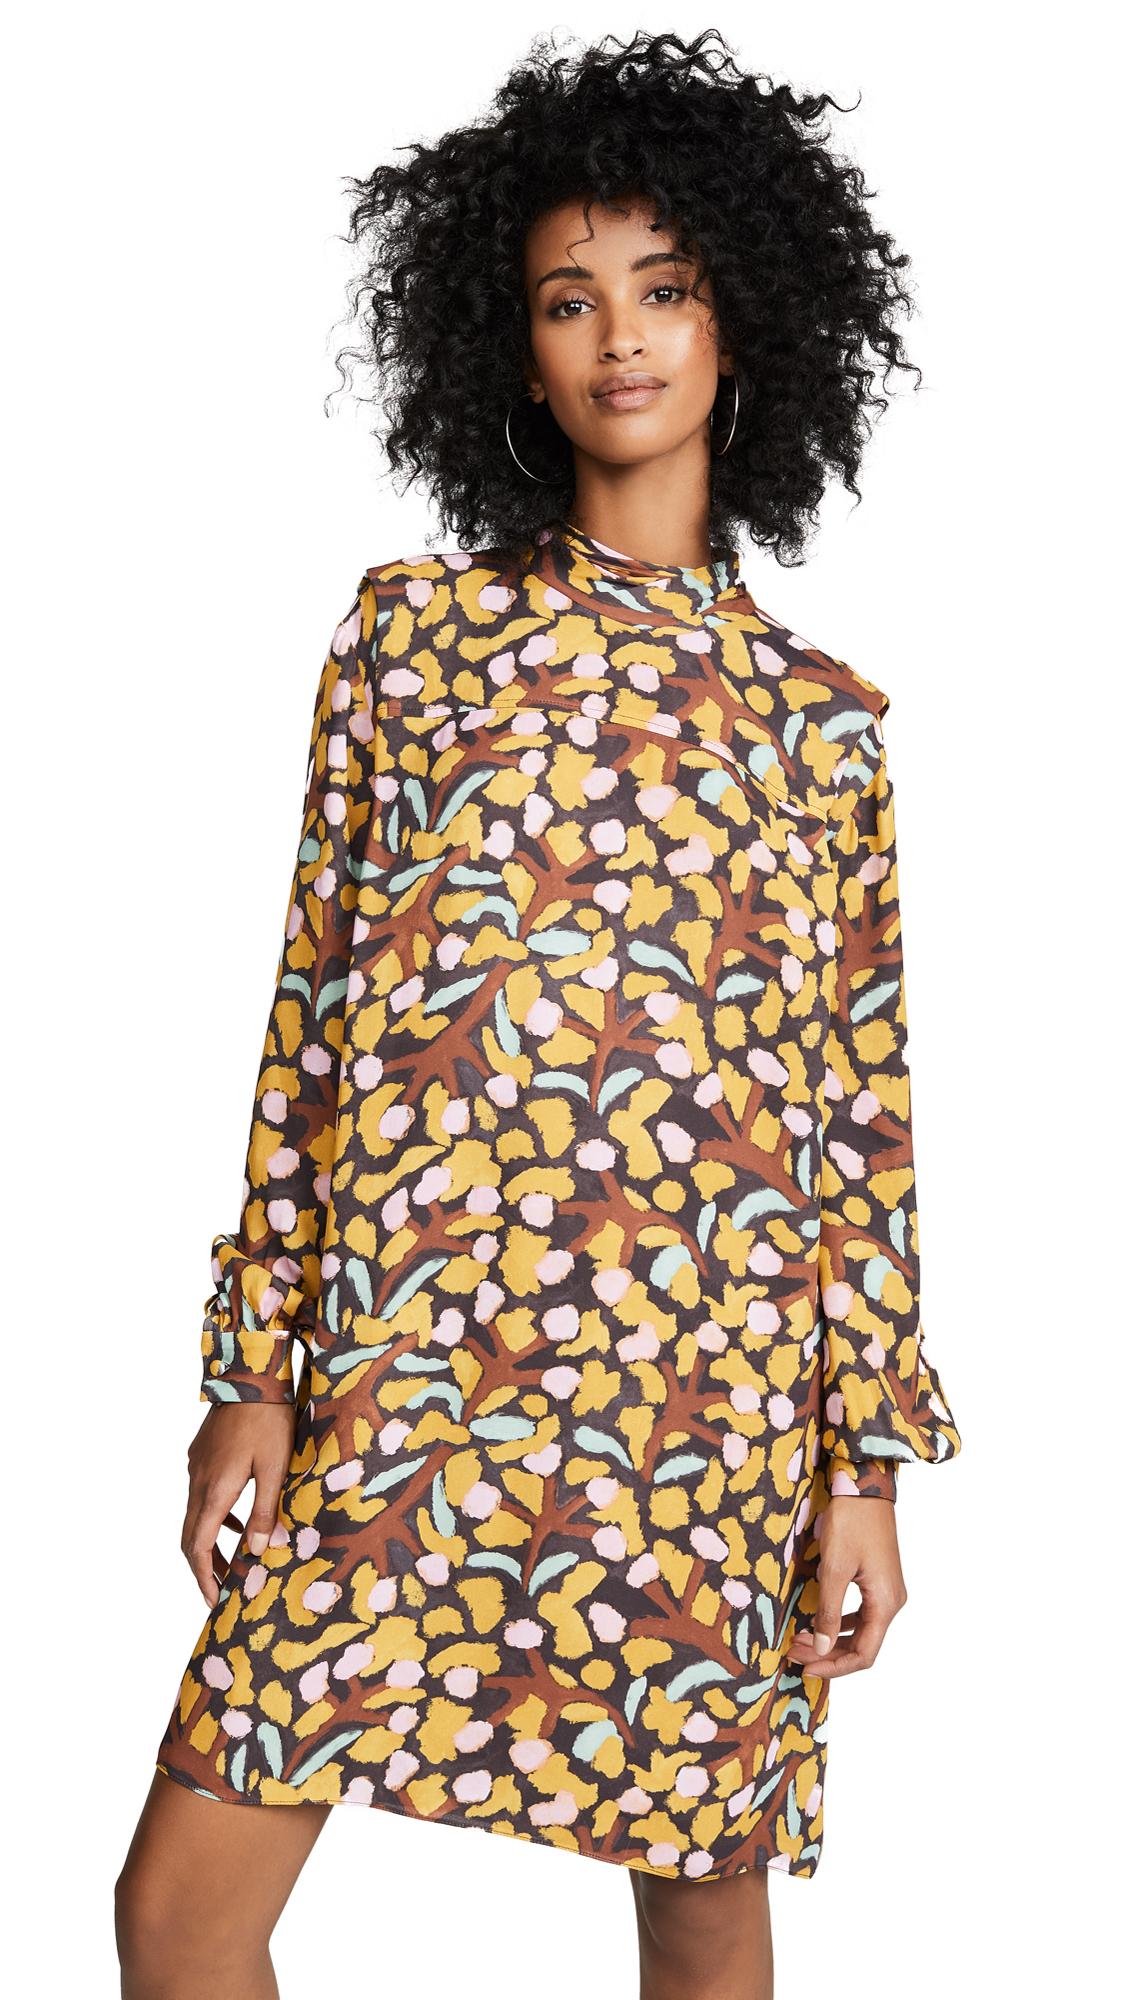 WHIT Alice Dress in Mustard/Multi